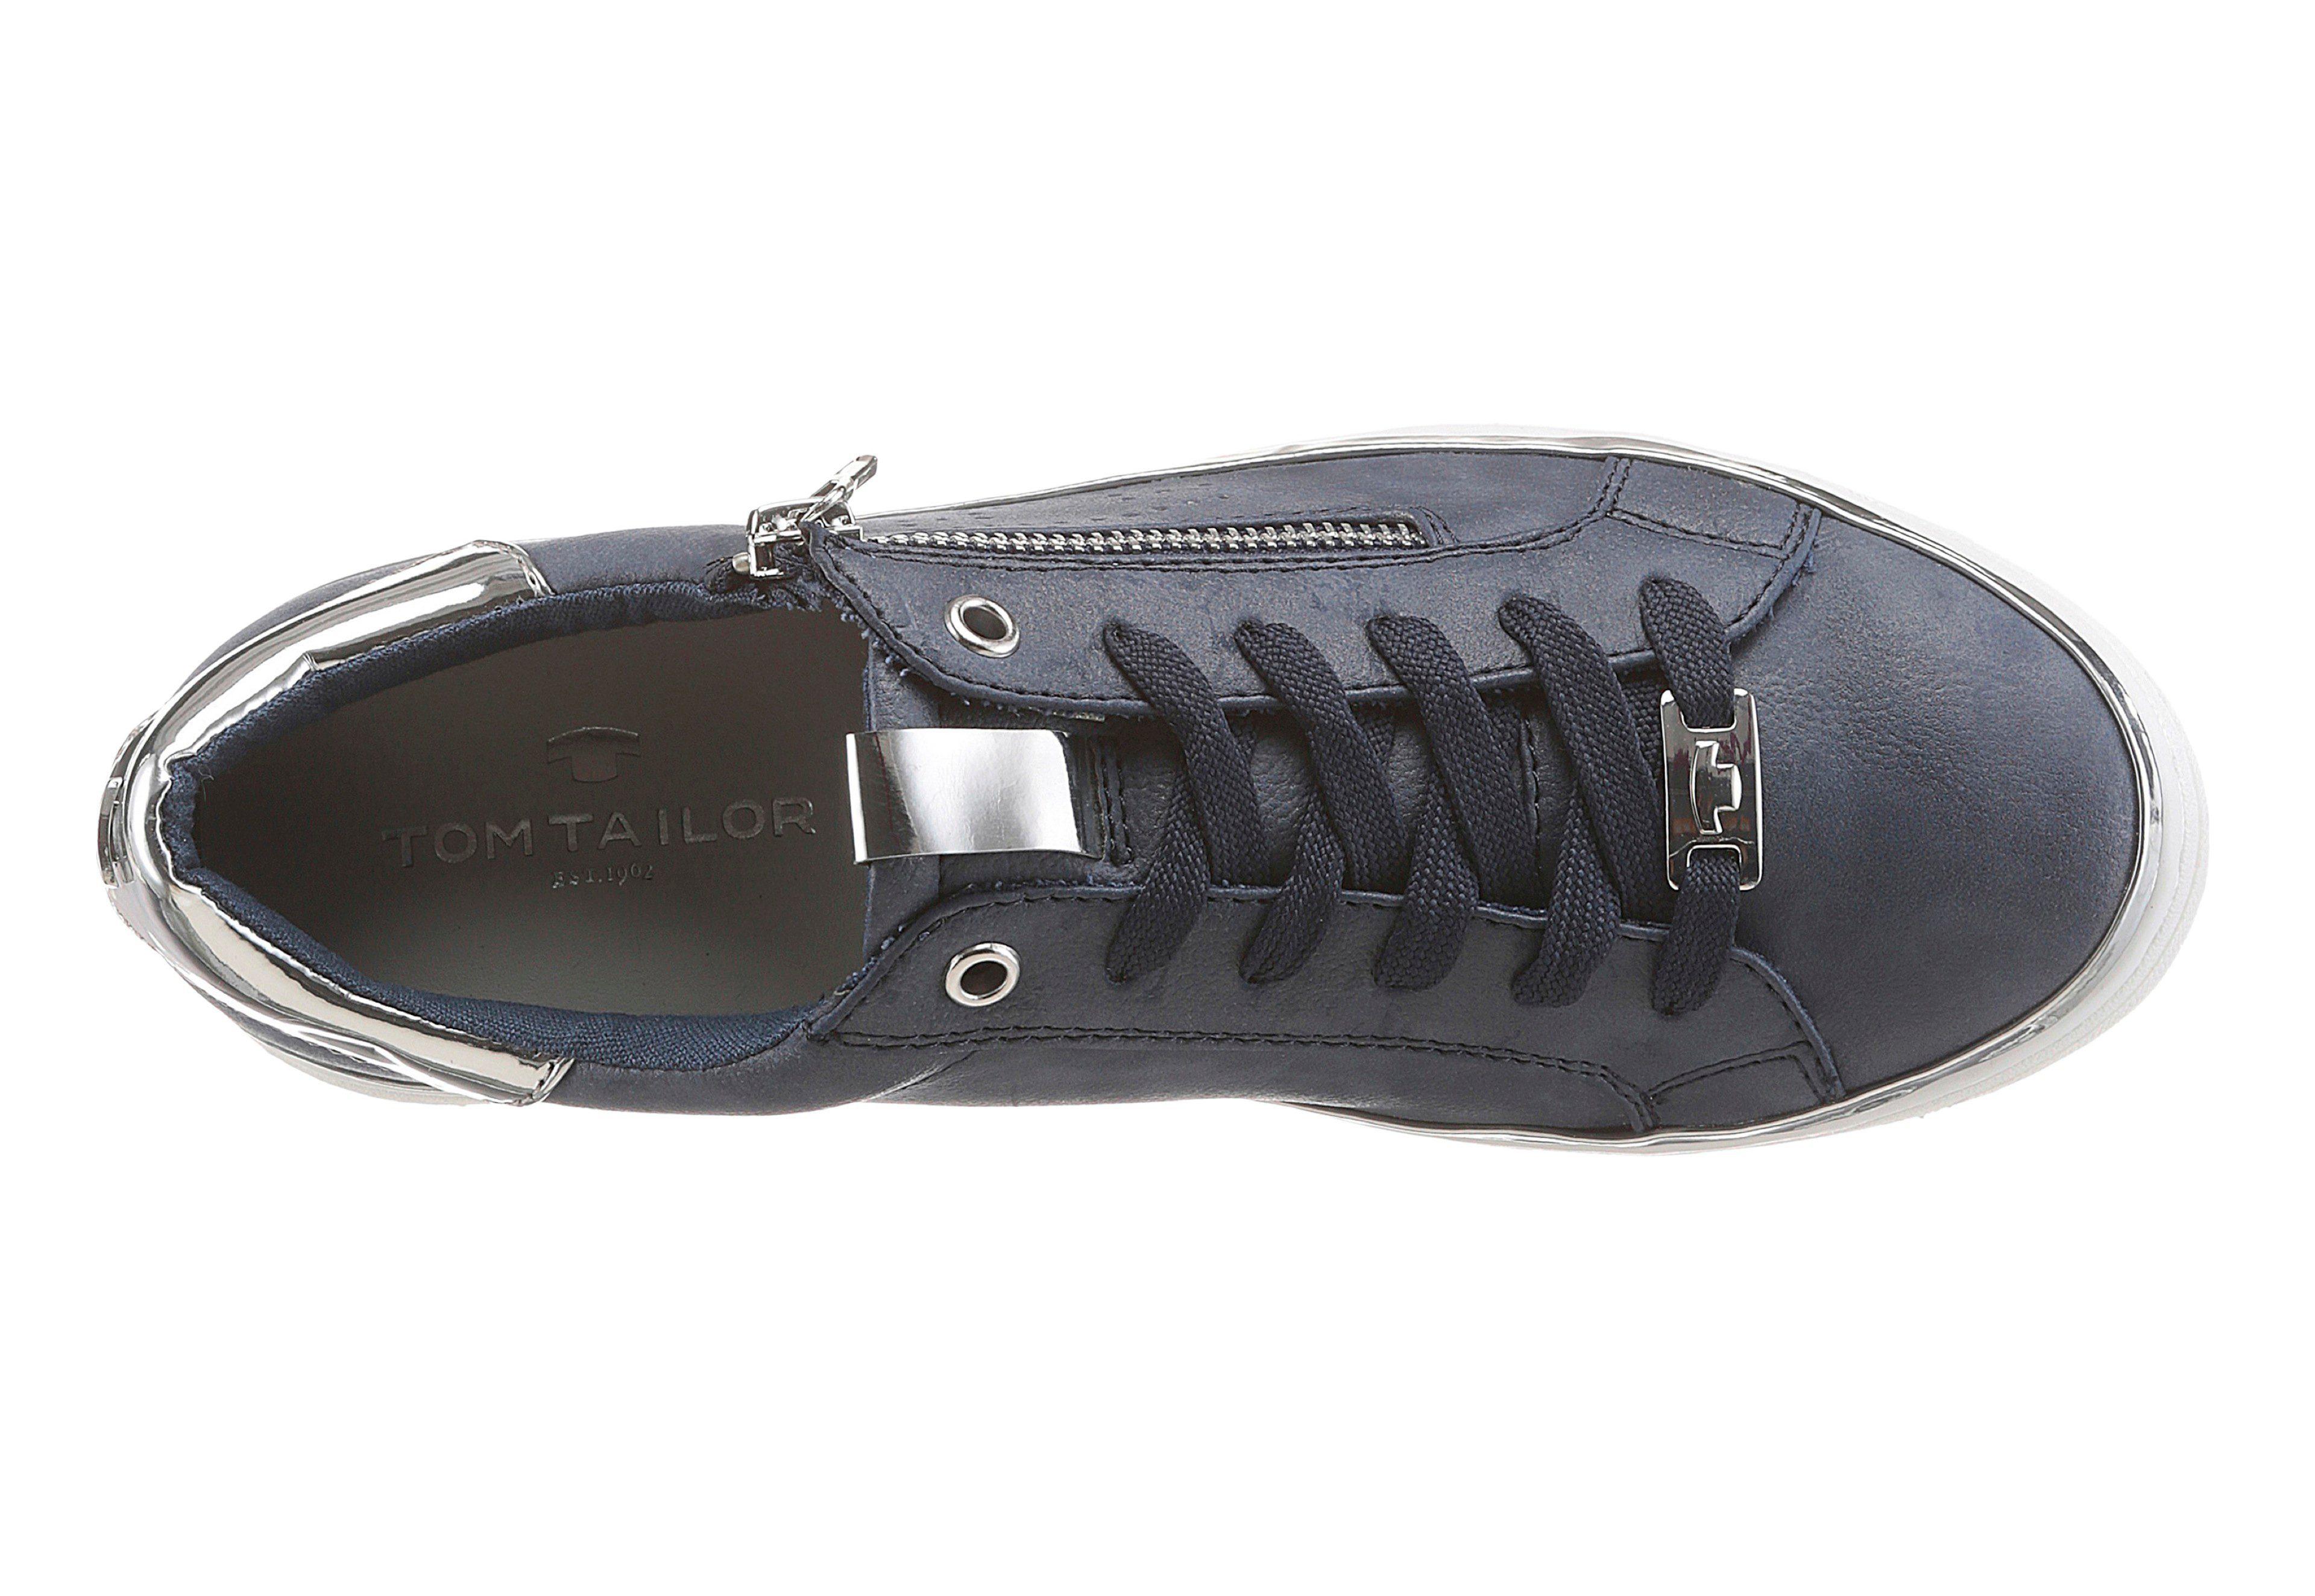 Billig >5402 trendigem Tom Tailor Sneaker mit trendigem >5402 Metallicapplikationen 83c702